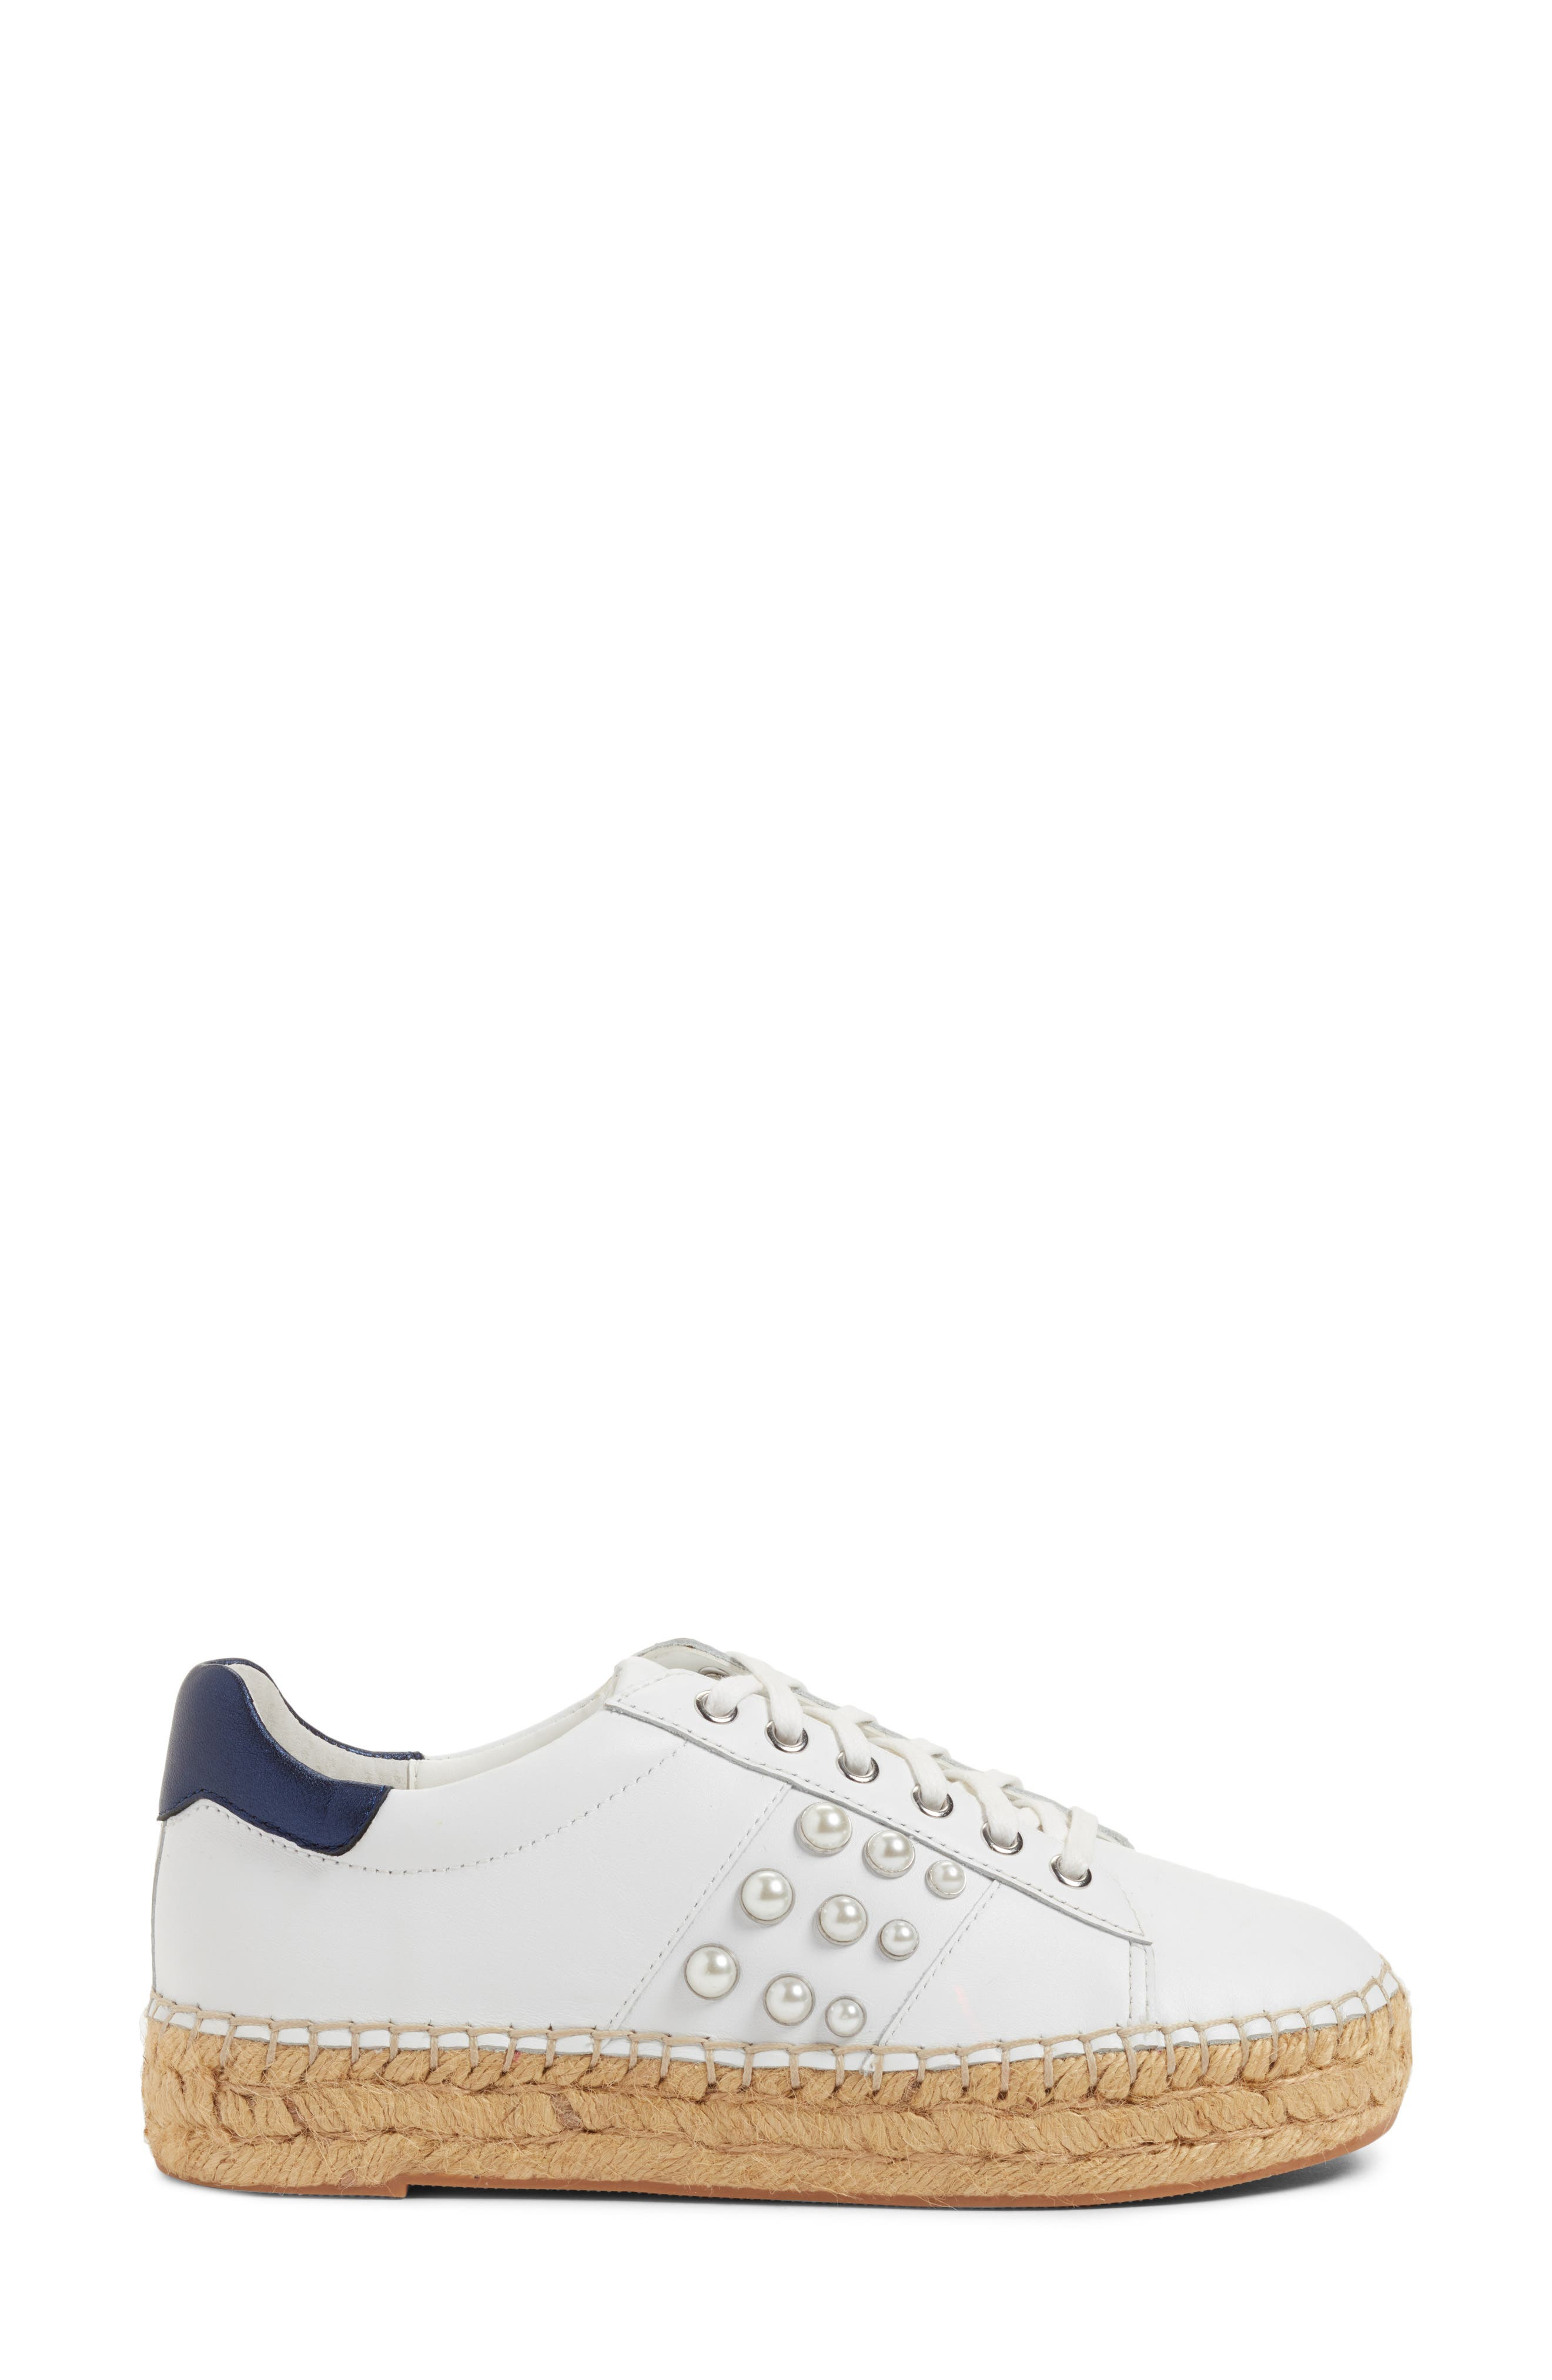 Marge Espadrille Platform Sneaker,                             Alternate thumbnail 3, color,                             White/ Navy Leather